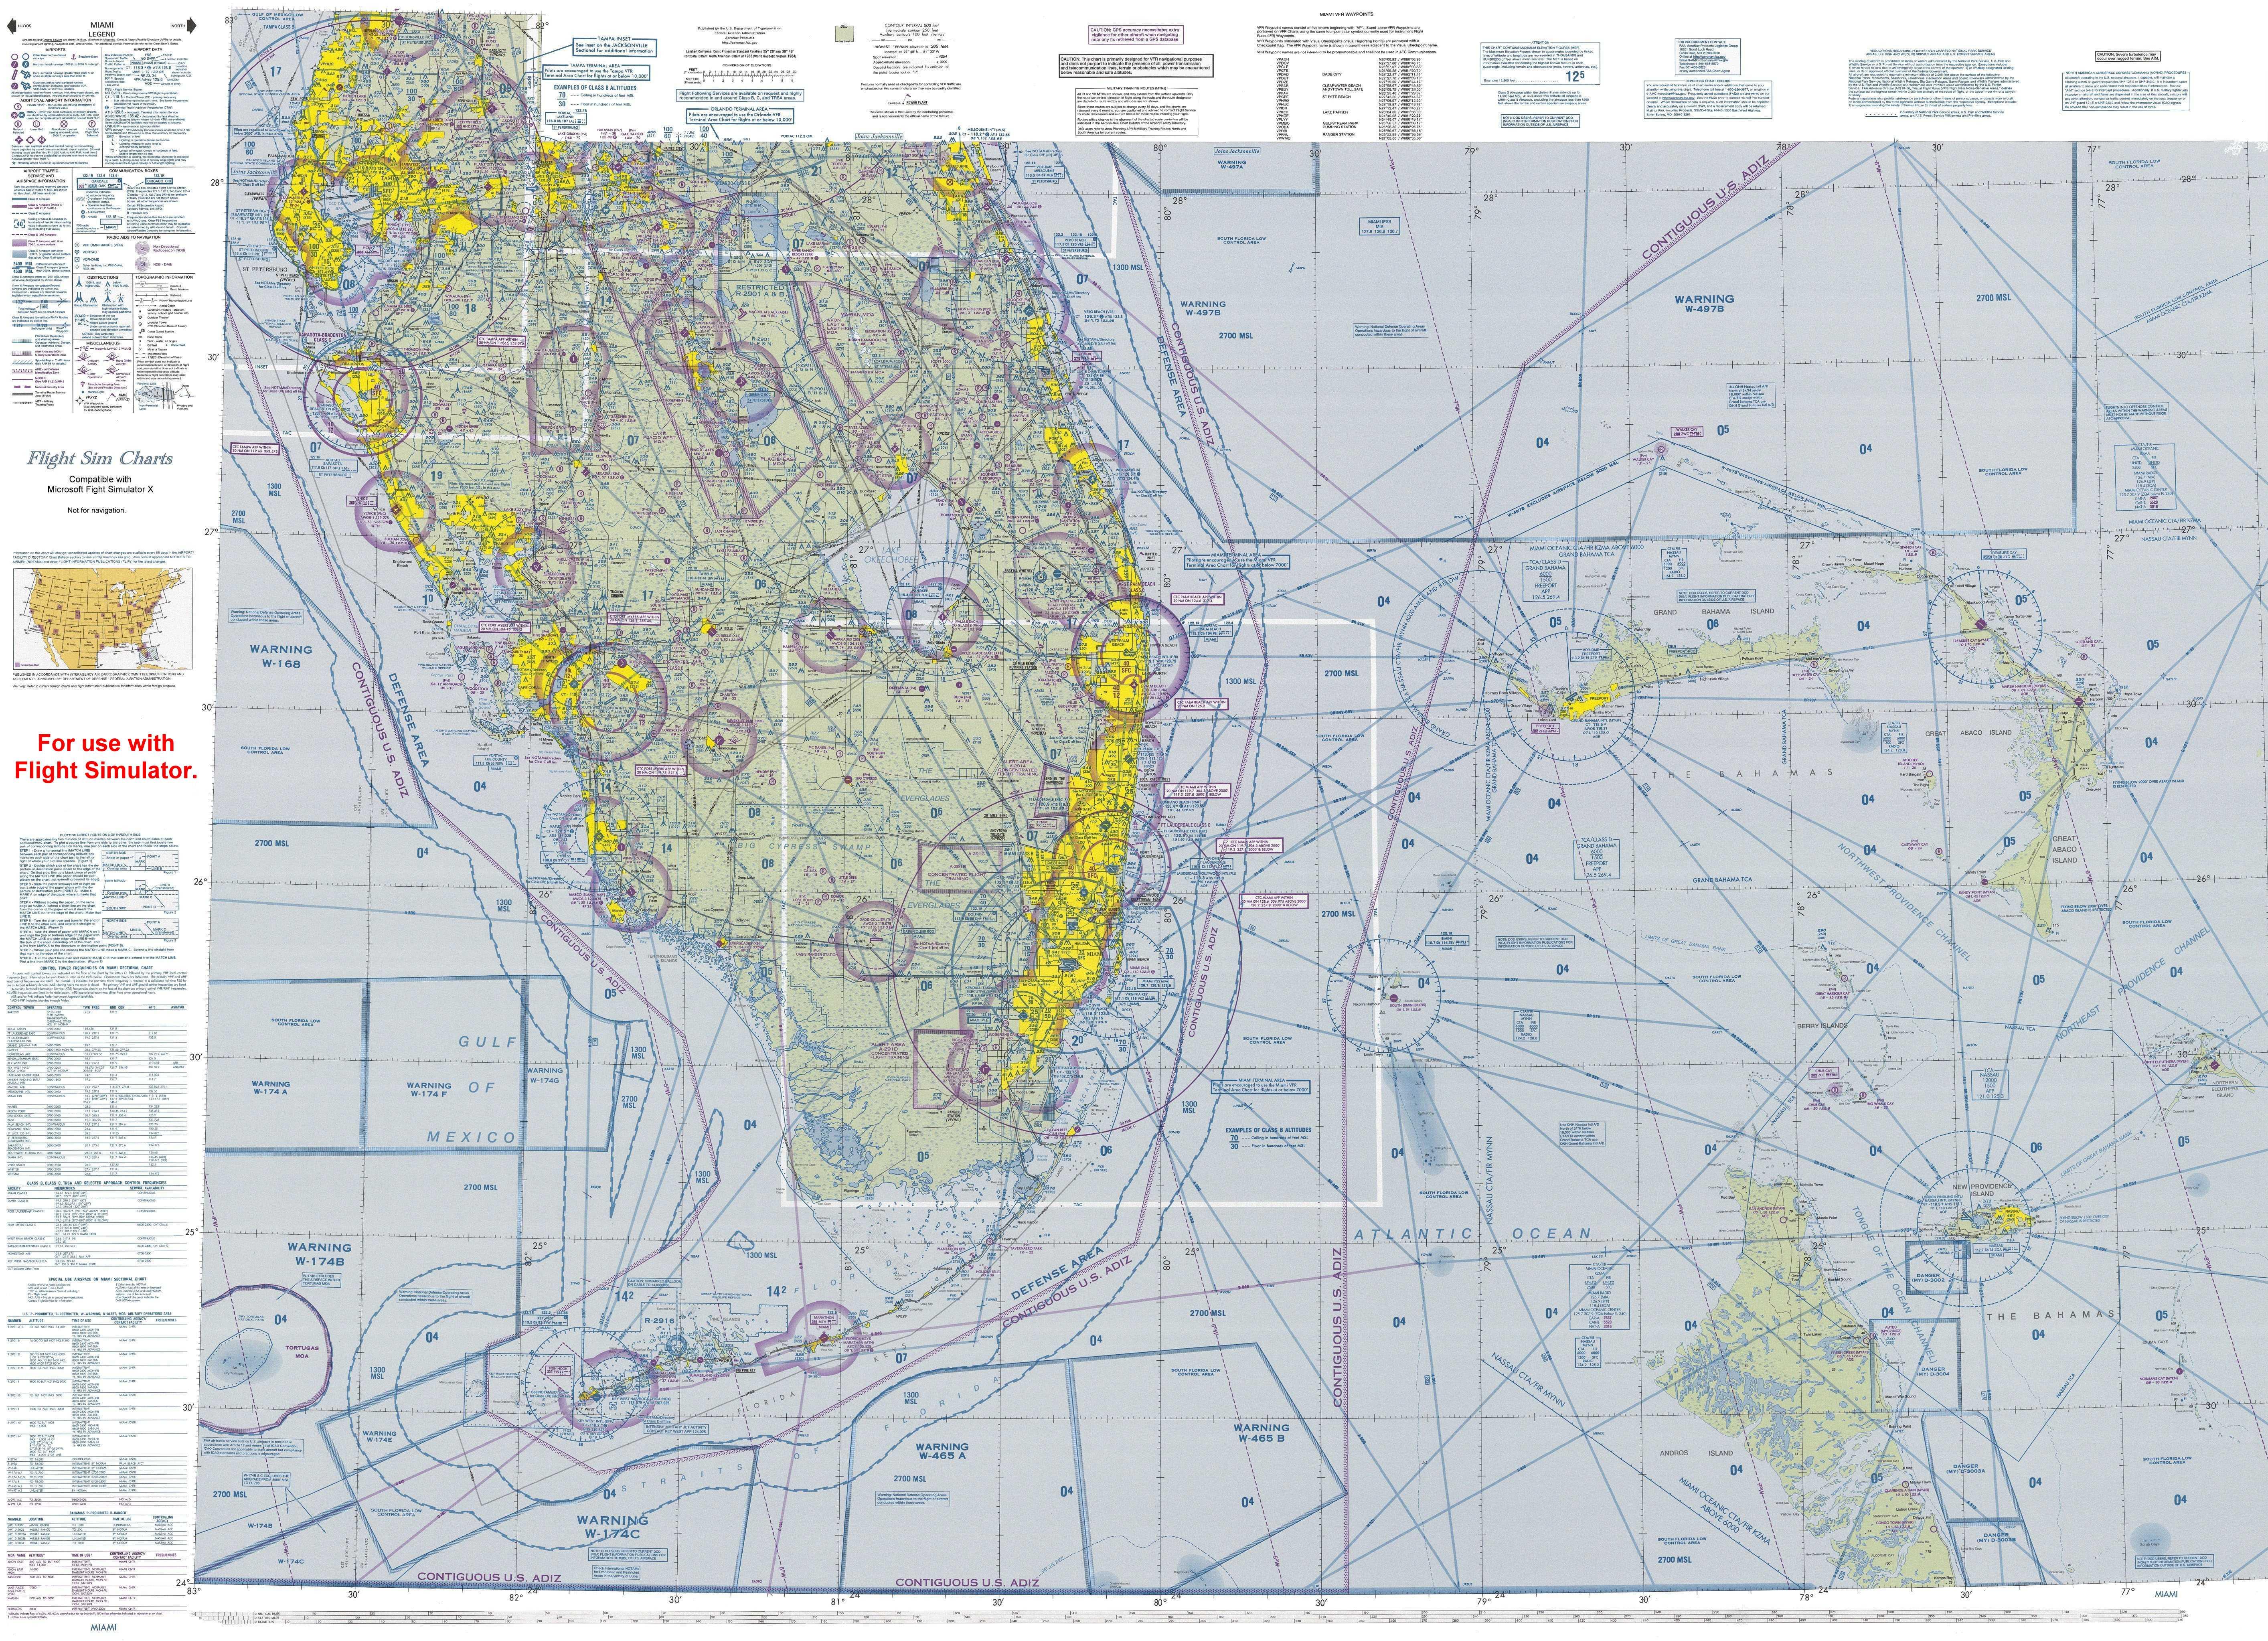 Cross Country Navigation Flight Simulator And Tablet